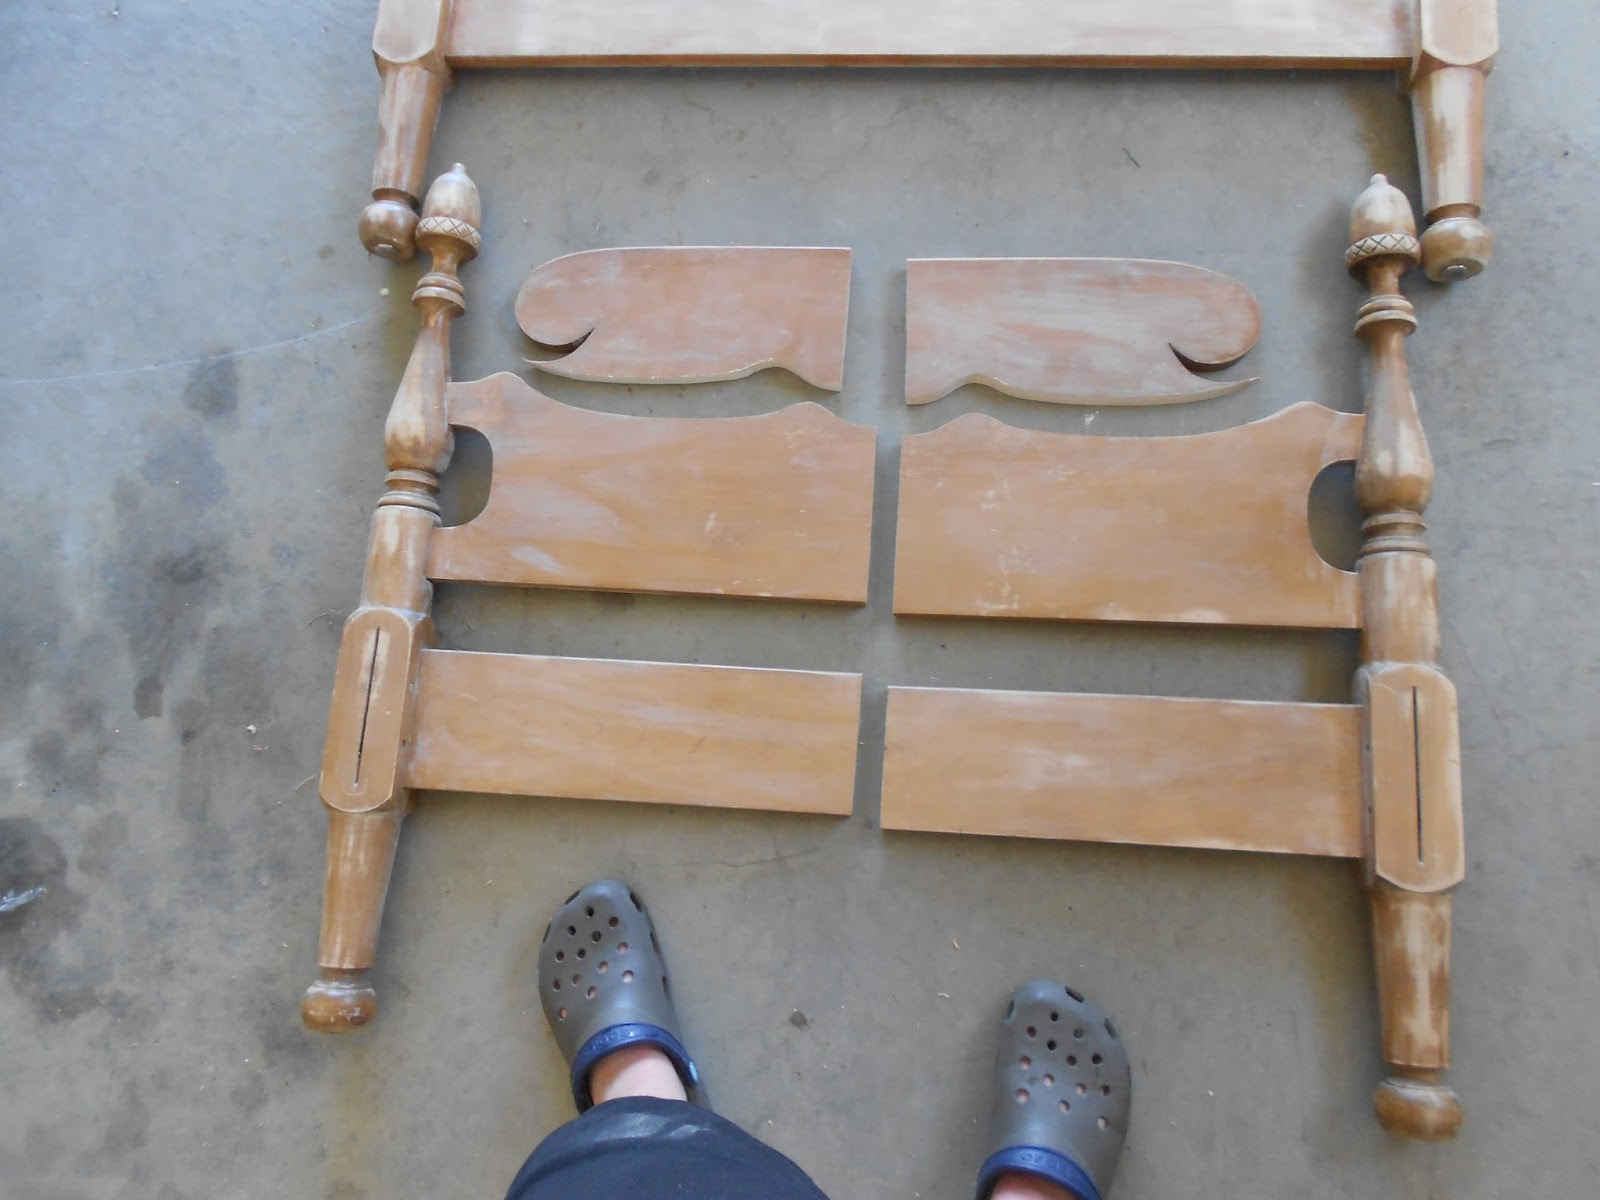 Creative Decor By Brooke: Free Headboard To Darling Bench